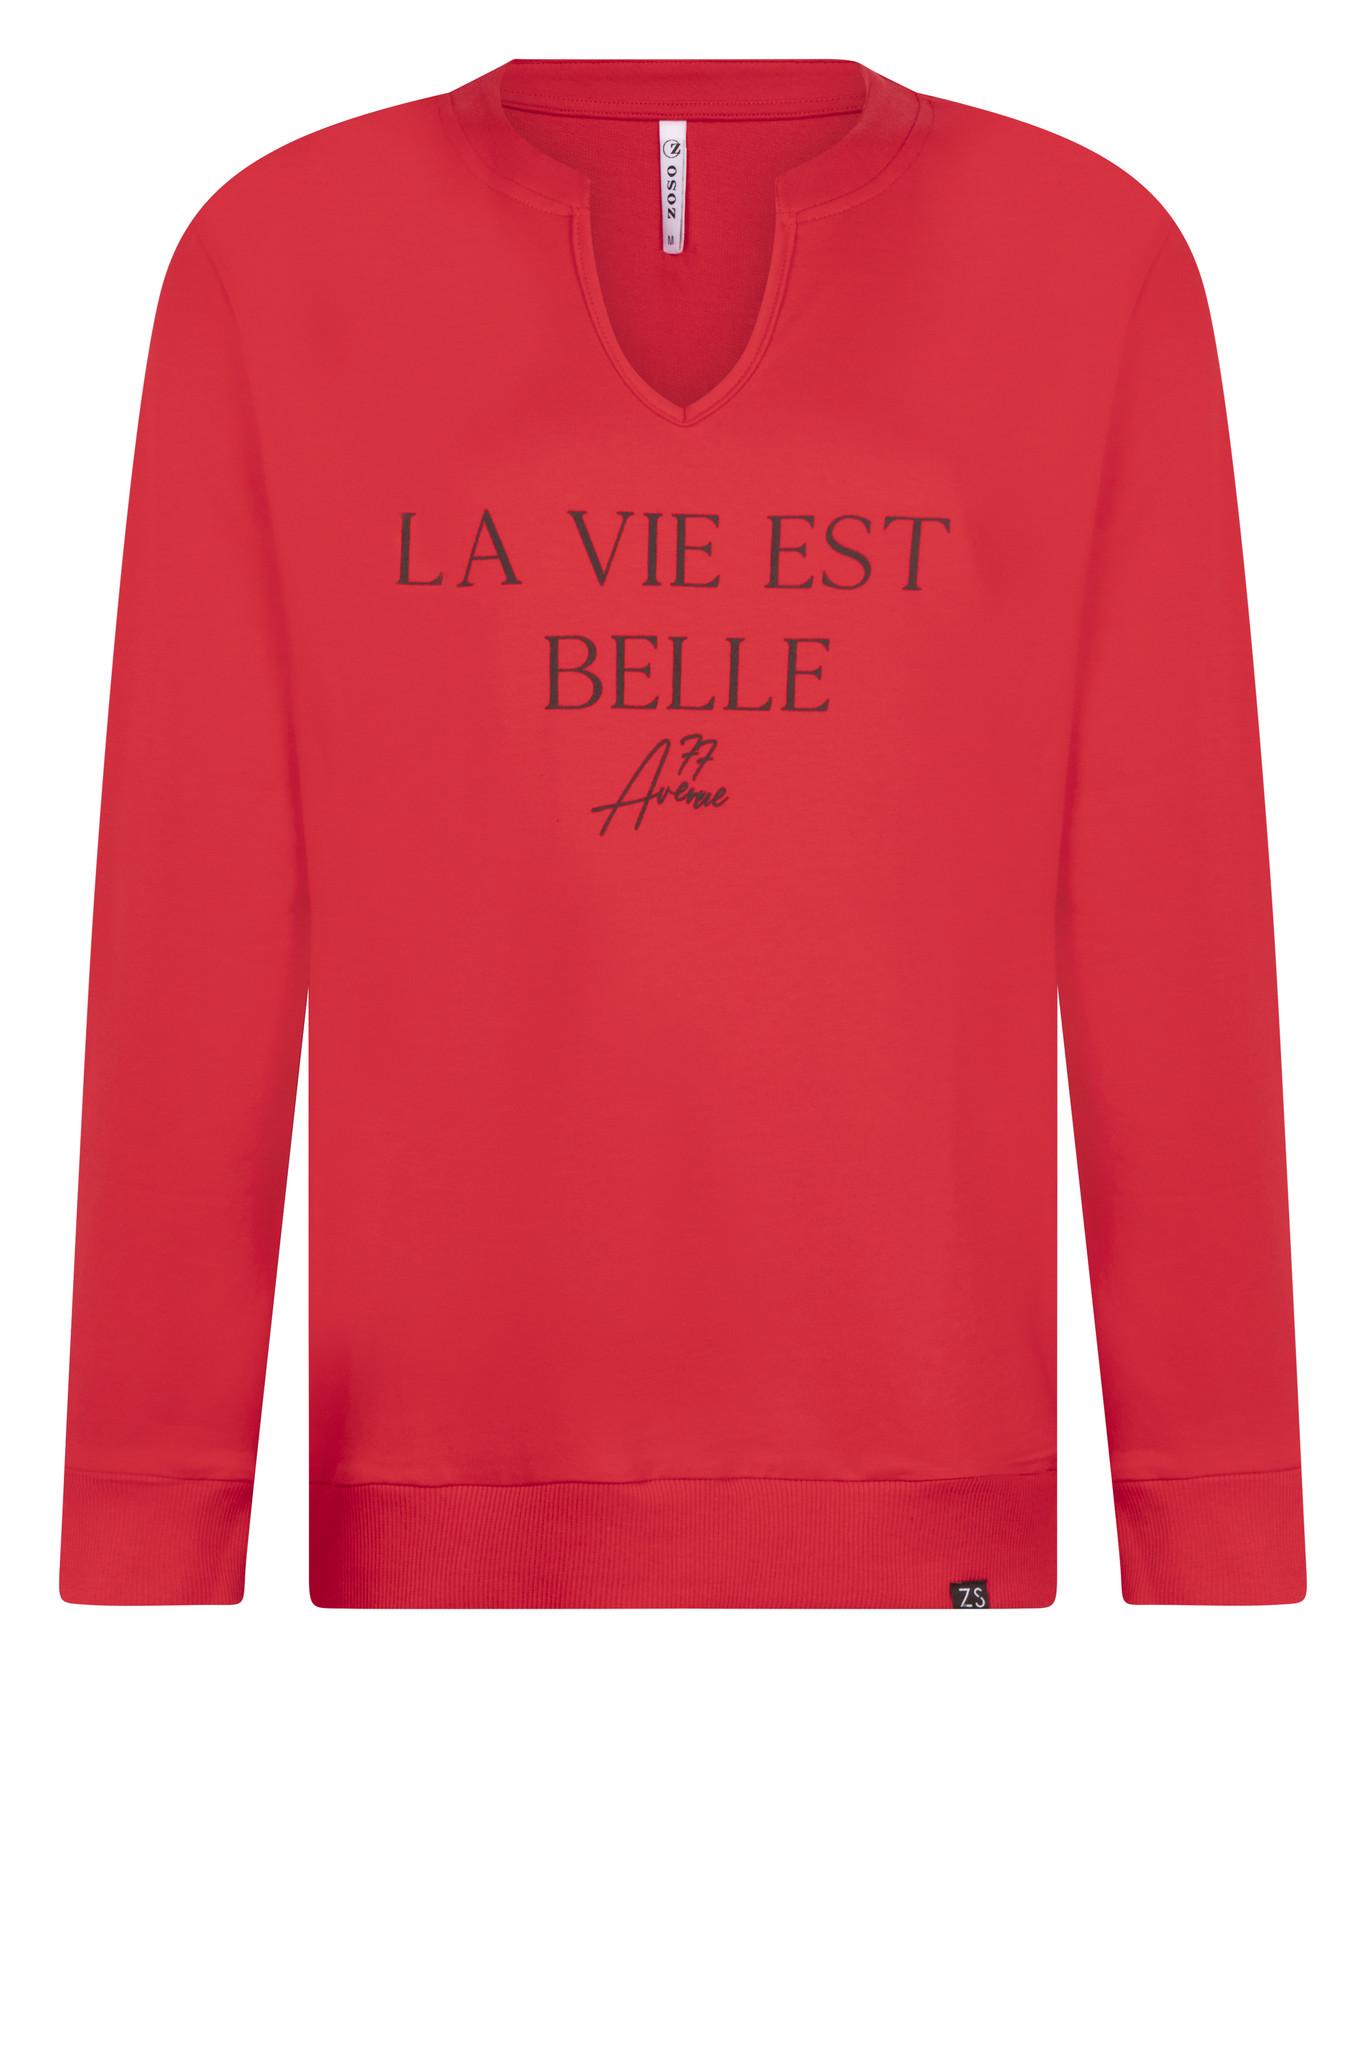 Zoso Zoso Belle trui chestprint rood/zwart